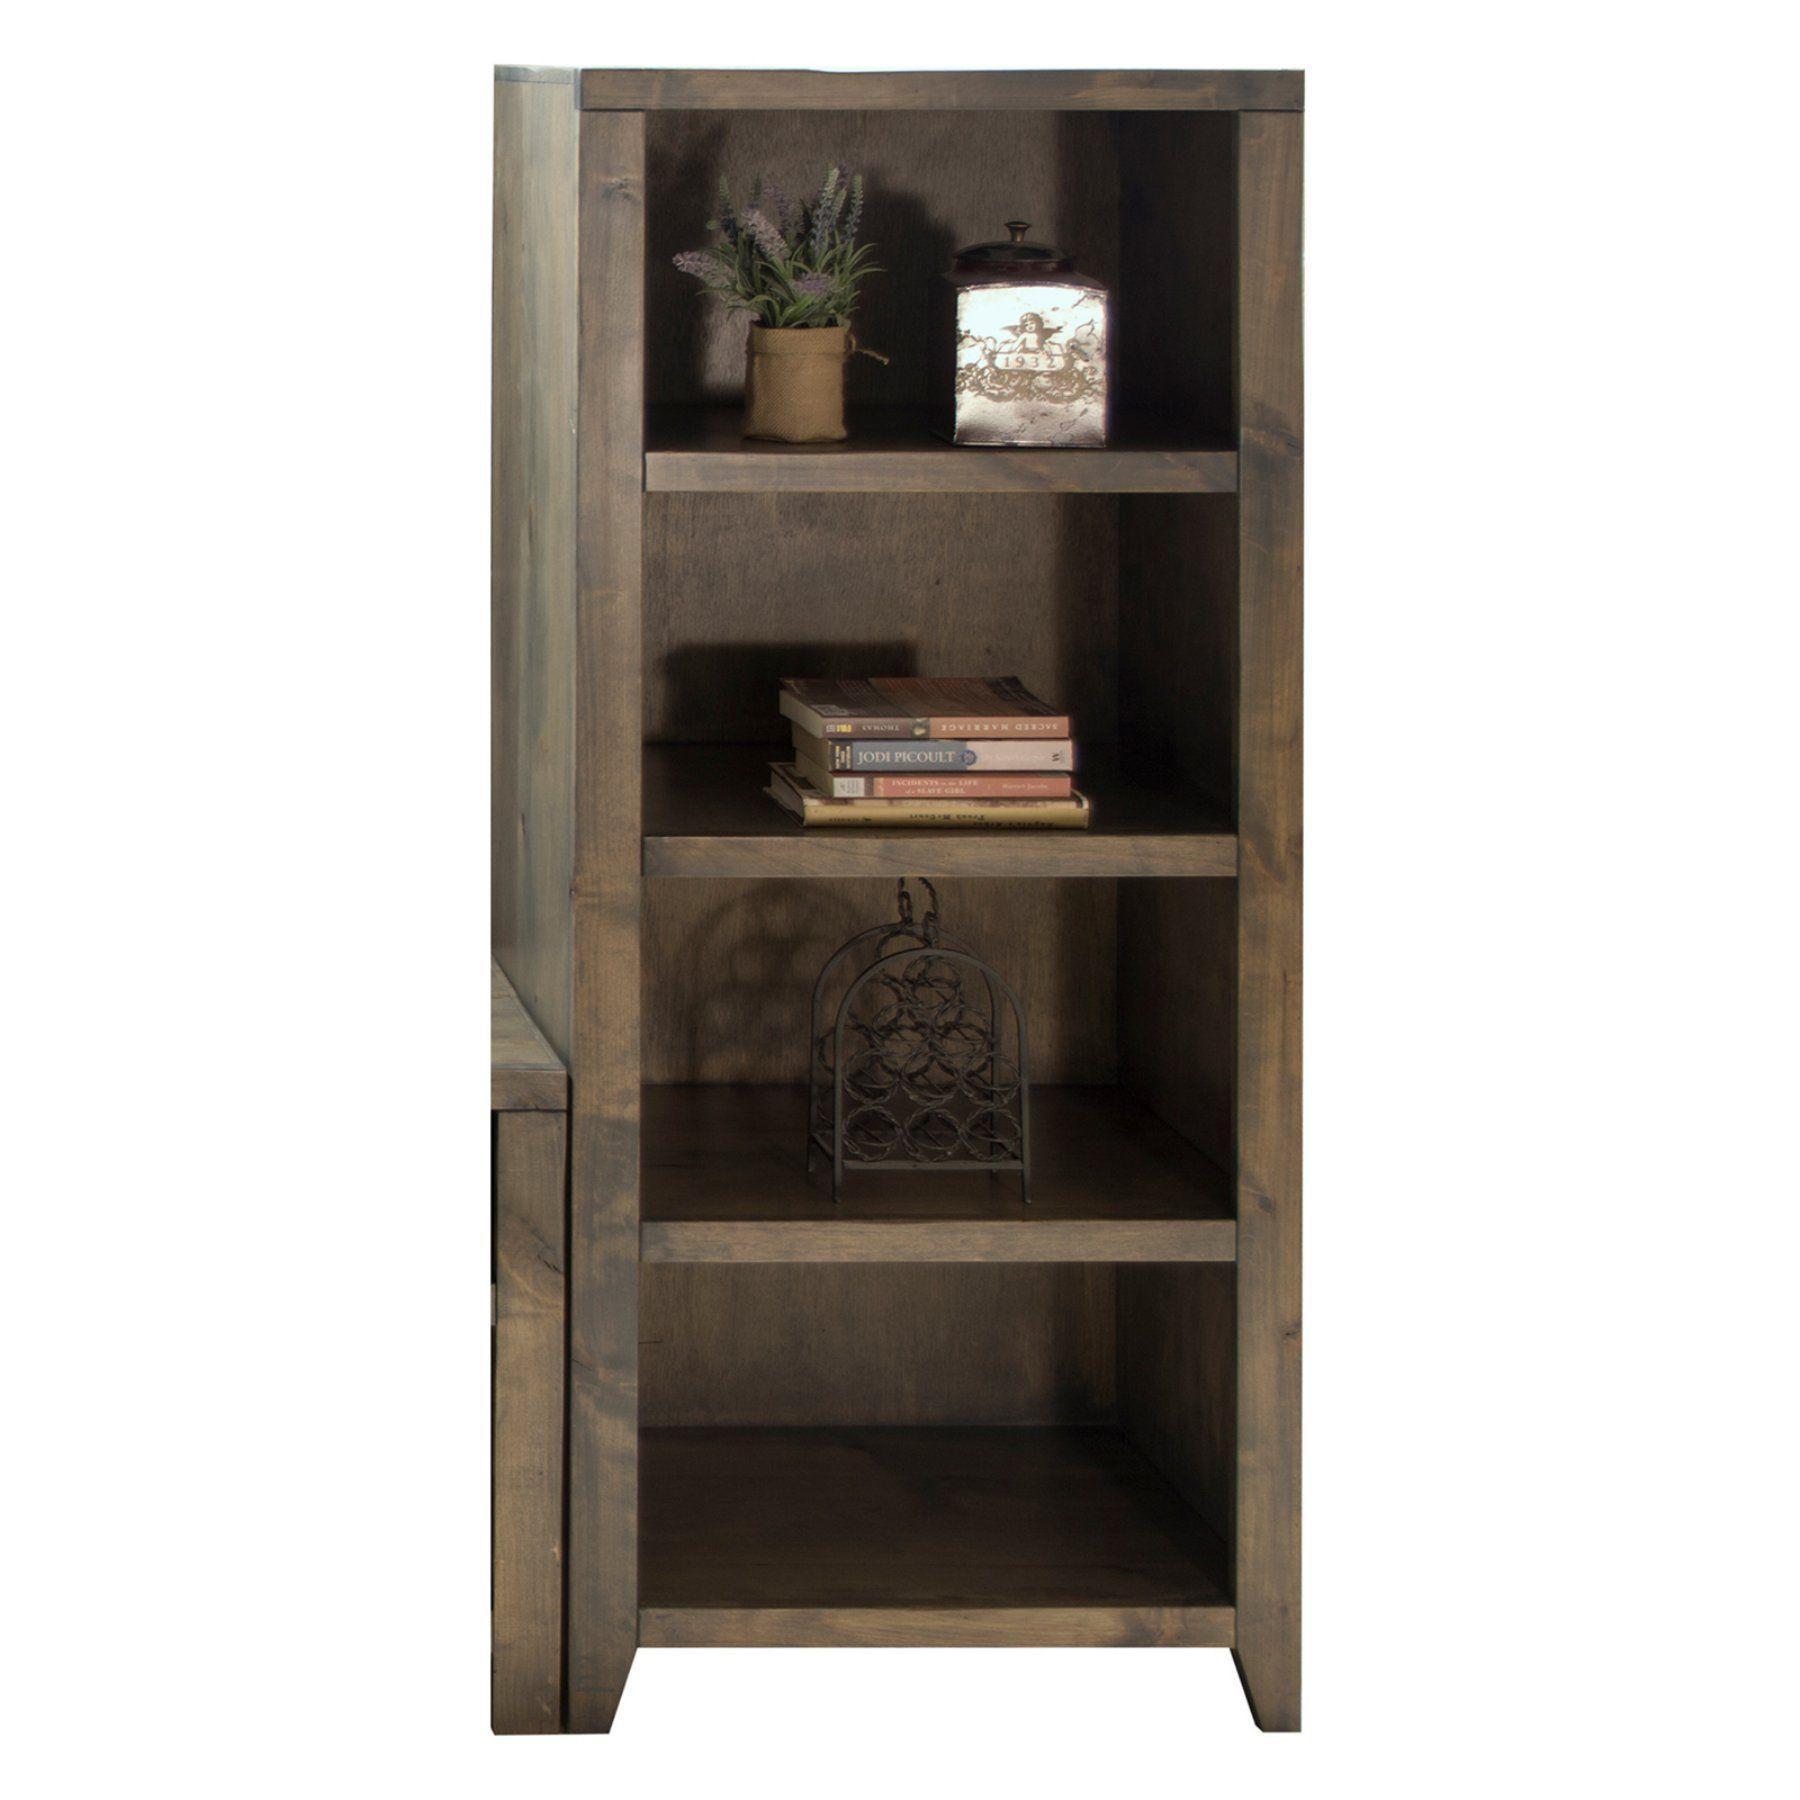 Legends Furniture Joshua Creek Bookcase Pier   JC3203.BNW